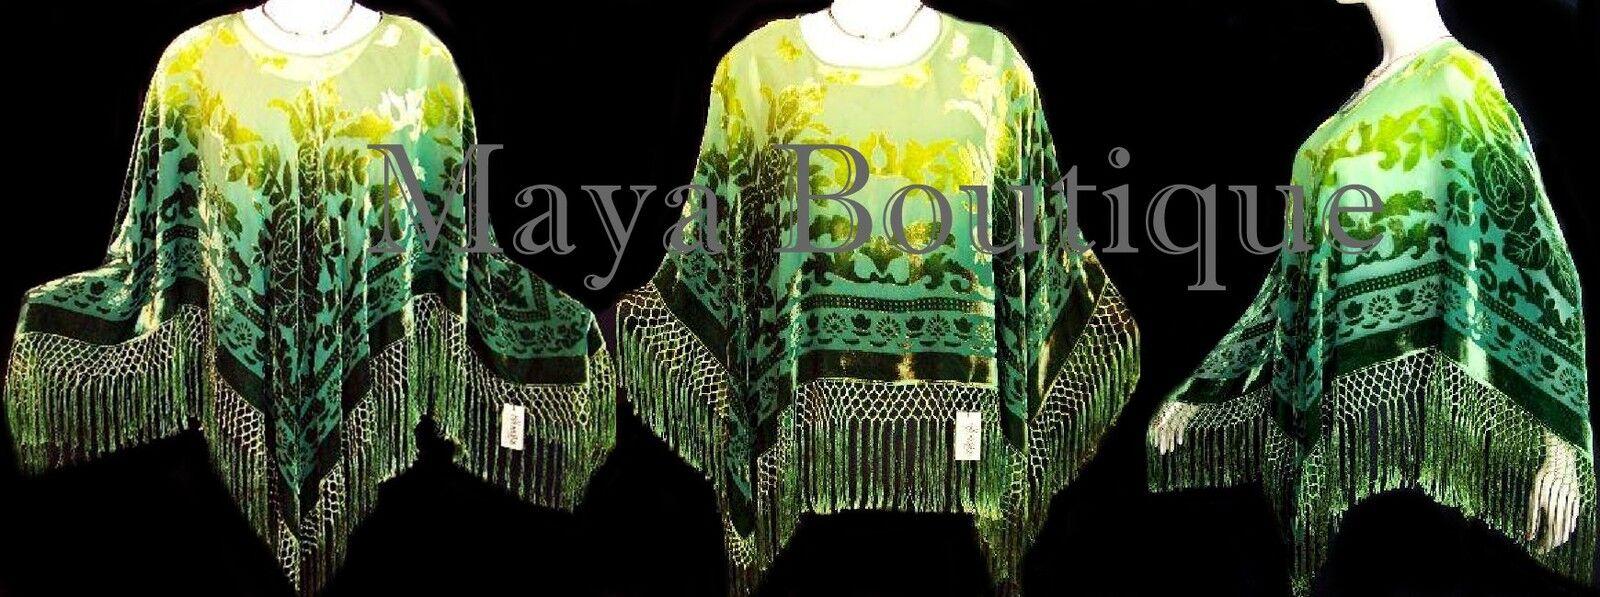 Dyed Silk Poncho Shawl Top Lime & Green Maya Matazaro